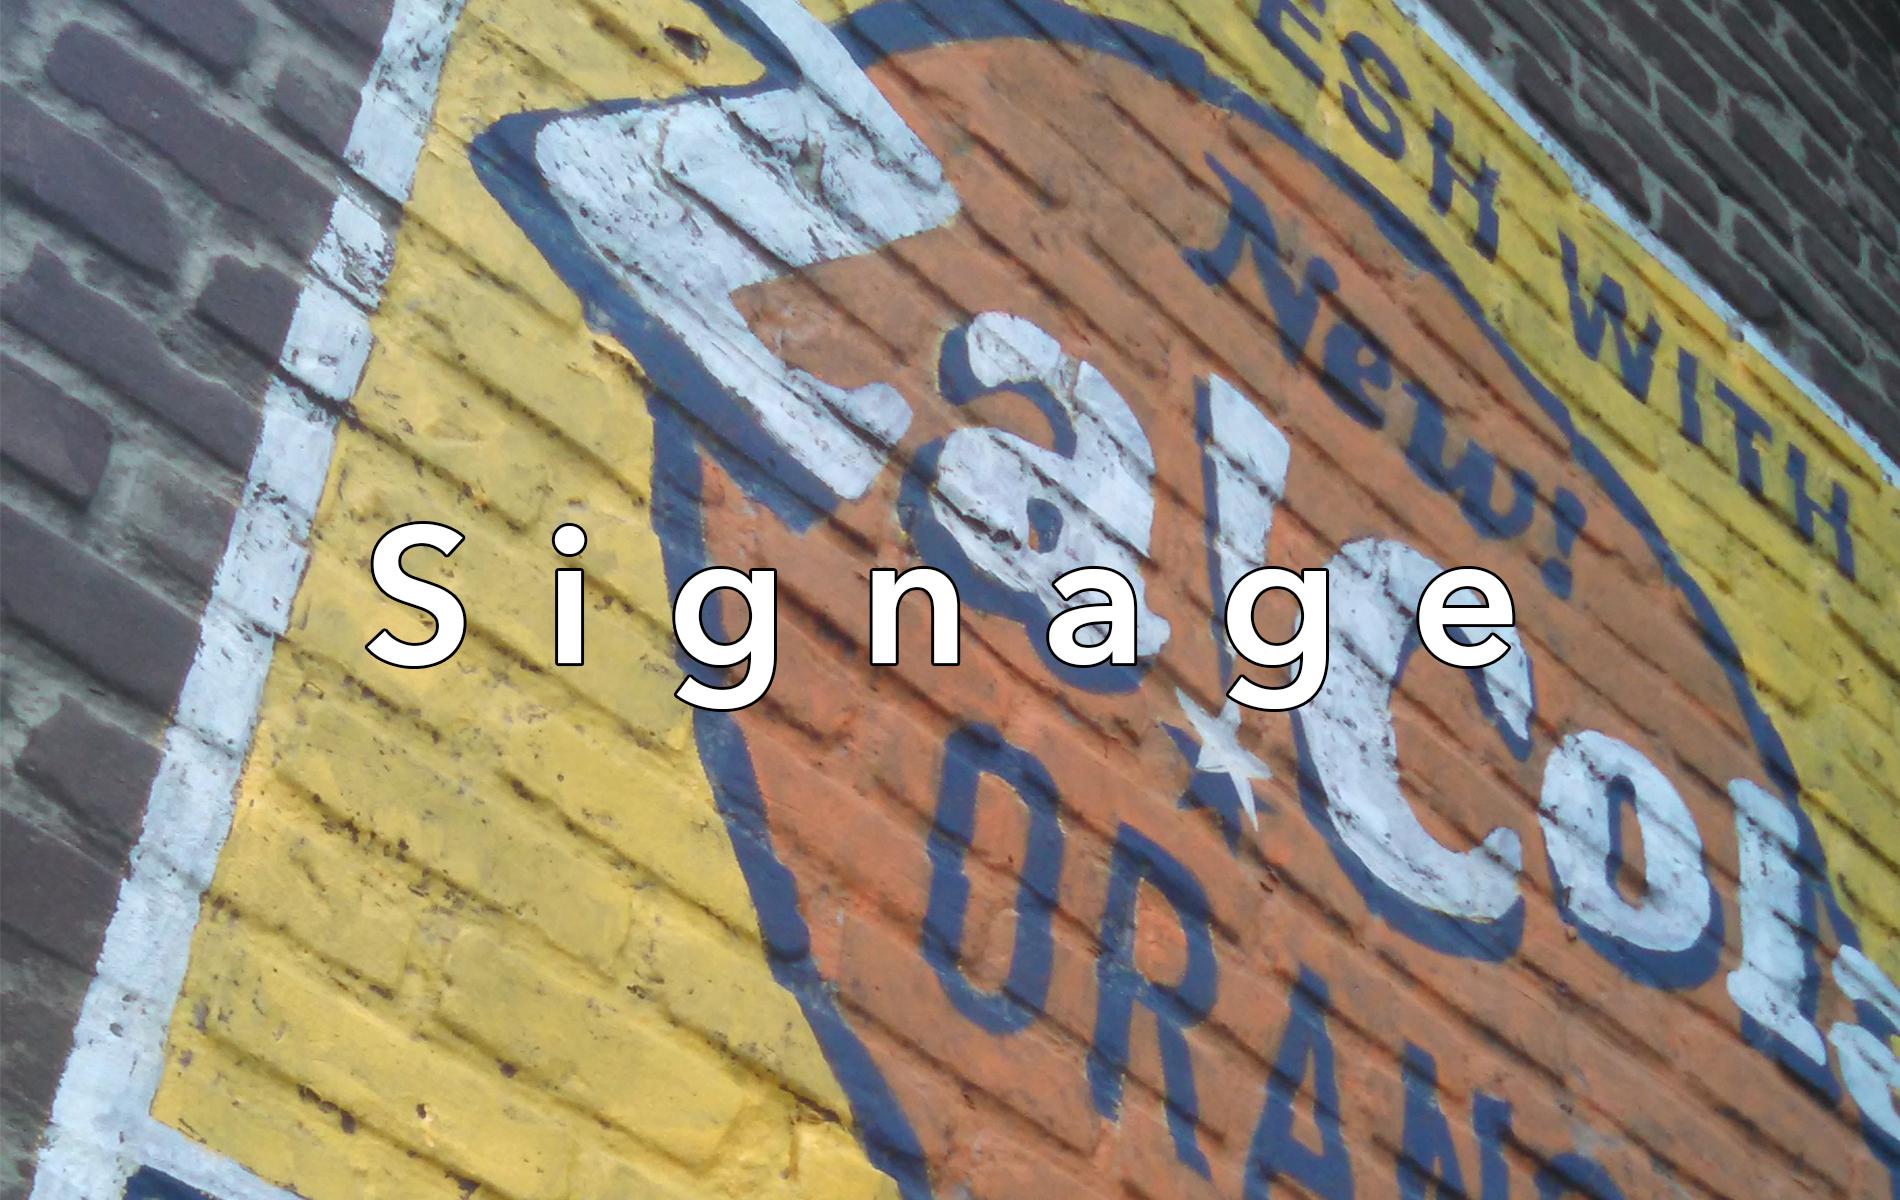 signage copy copy.jpg